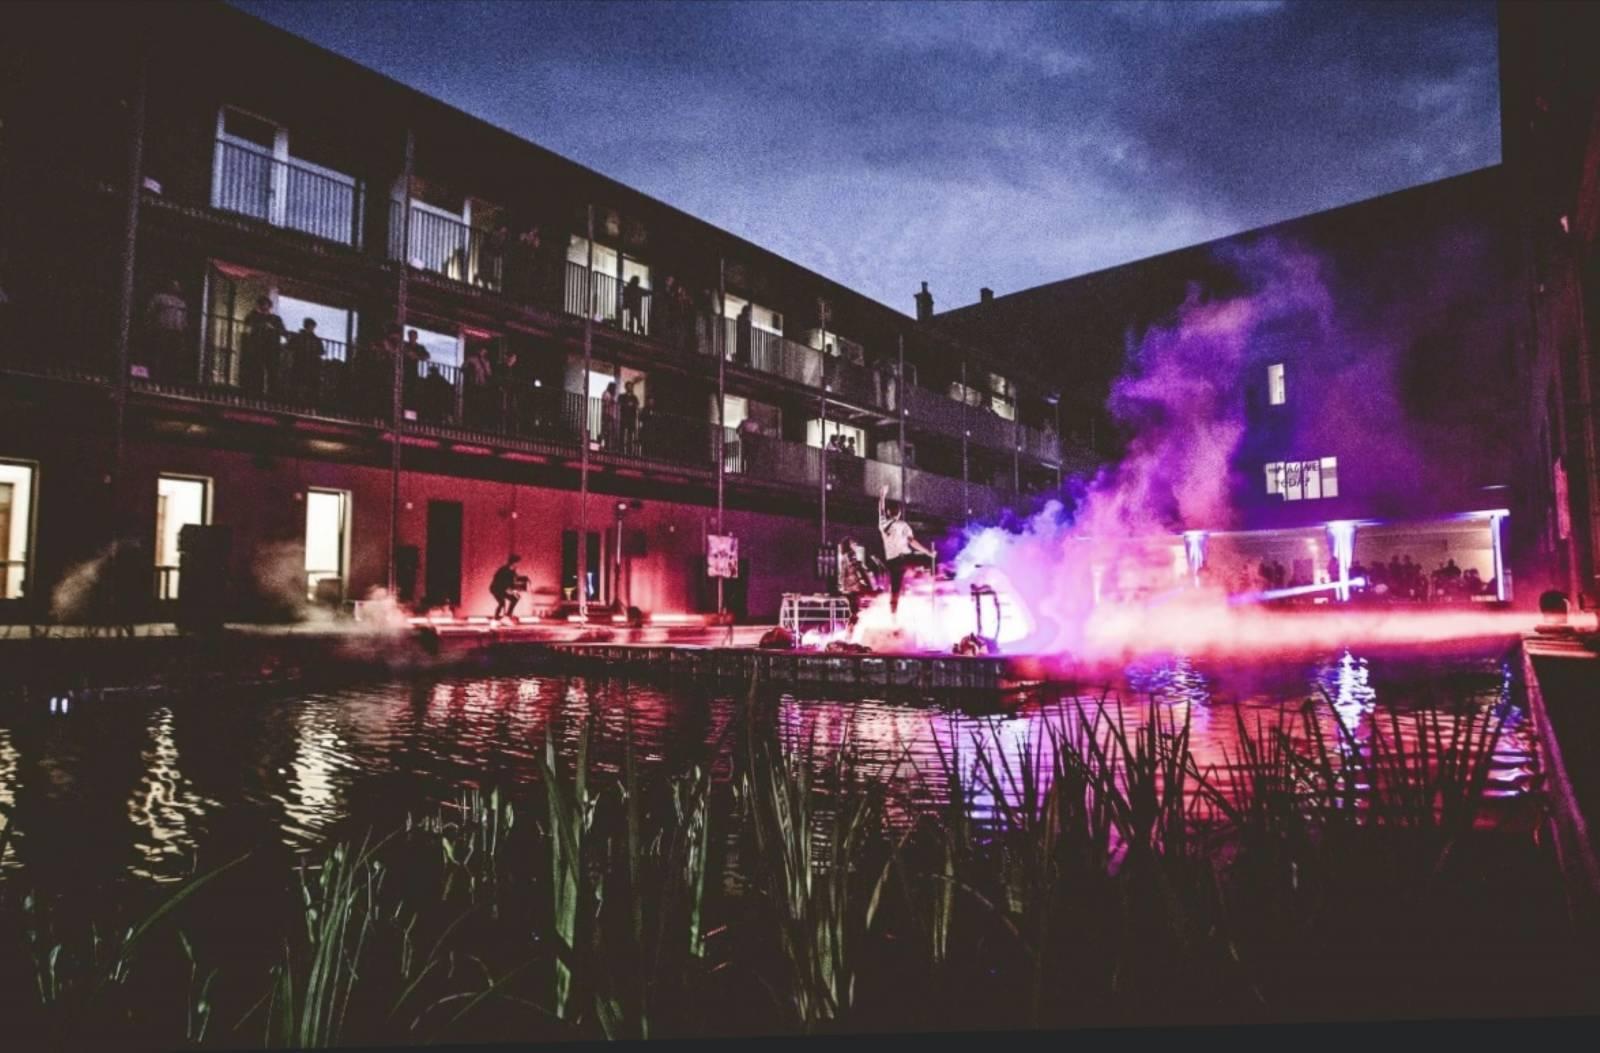 Feestal - Van der Valk hotel Mechelen - House of Weddings (19)